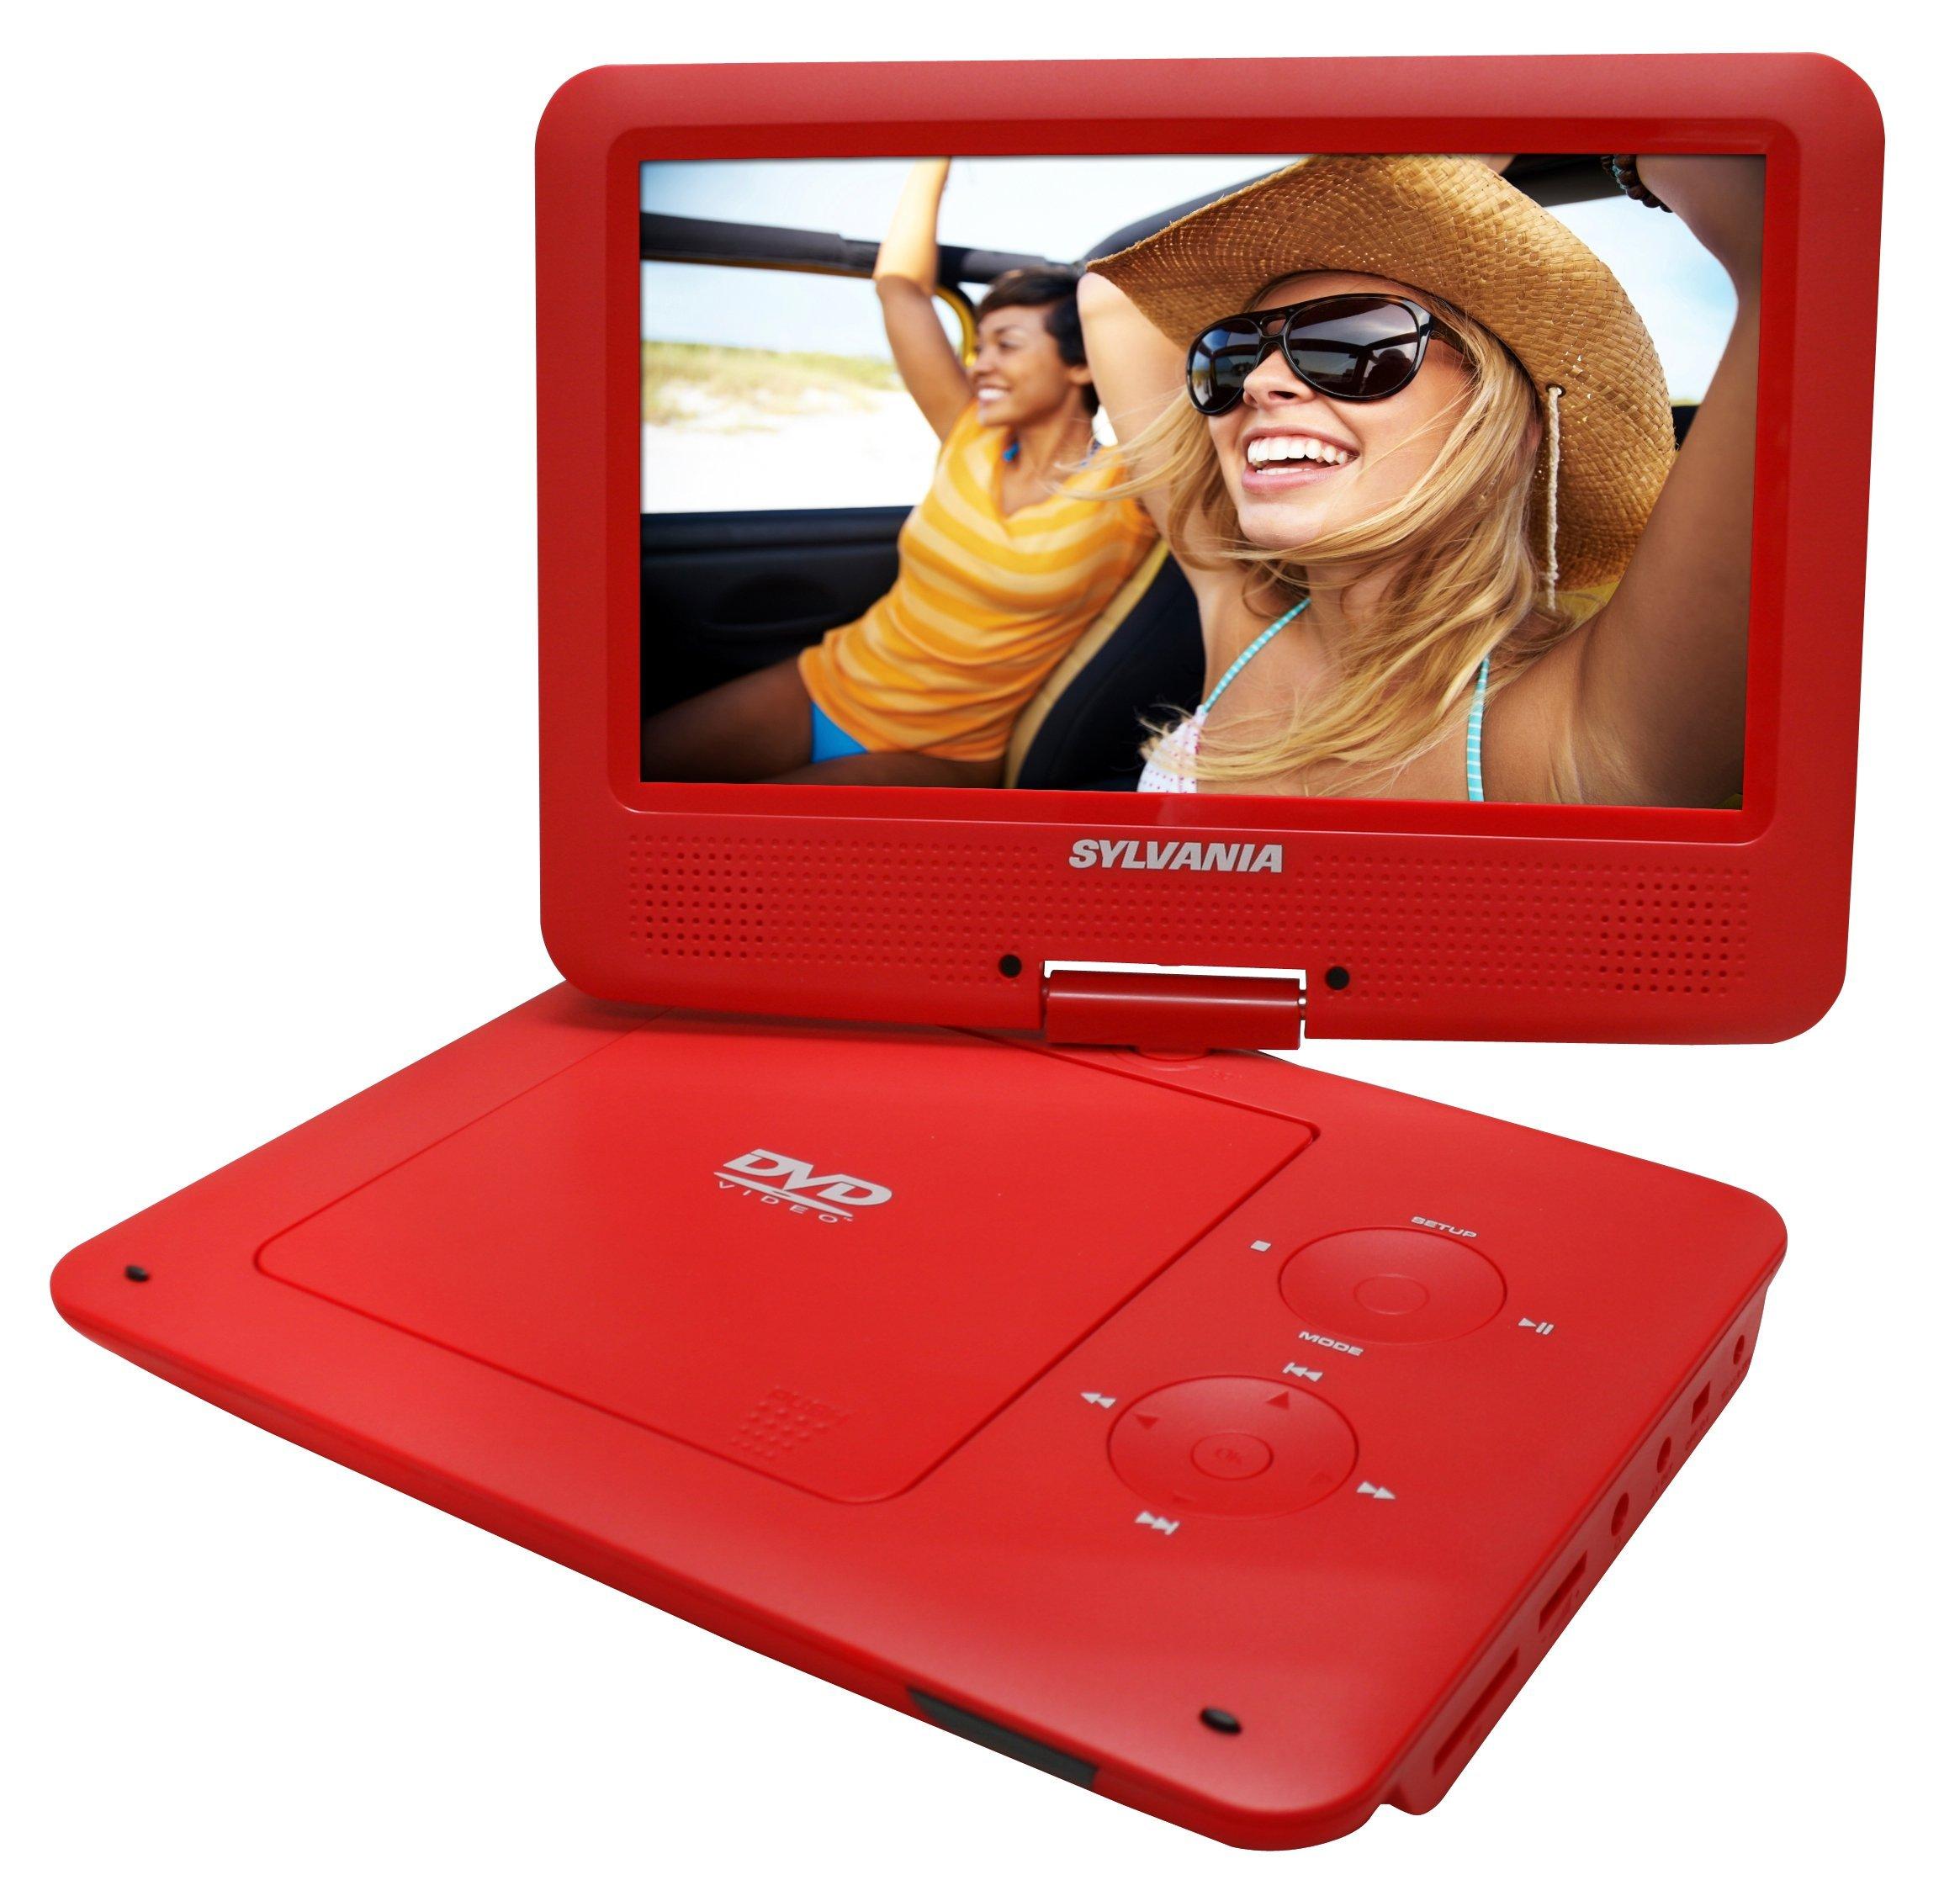 Sylvania SDVD9020B-RED 9-Inch Swivel Screen Portable DVD Player (Certified Refurbished)